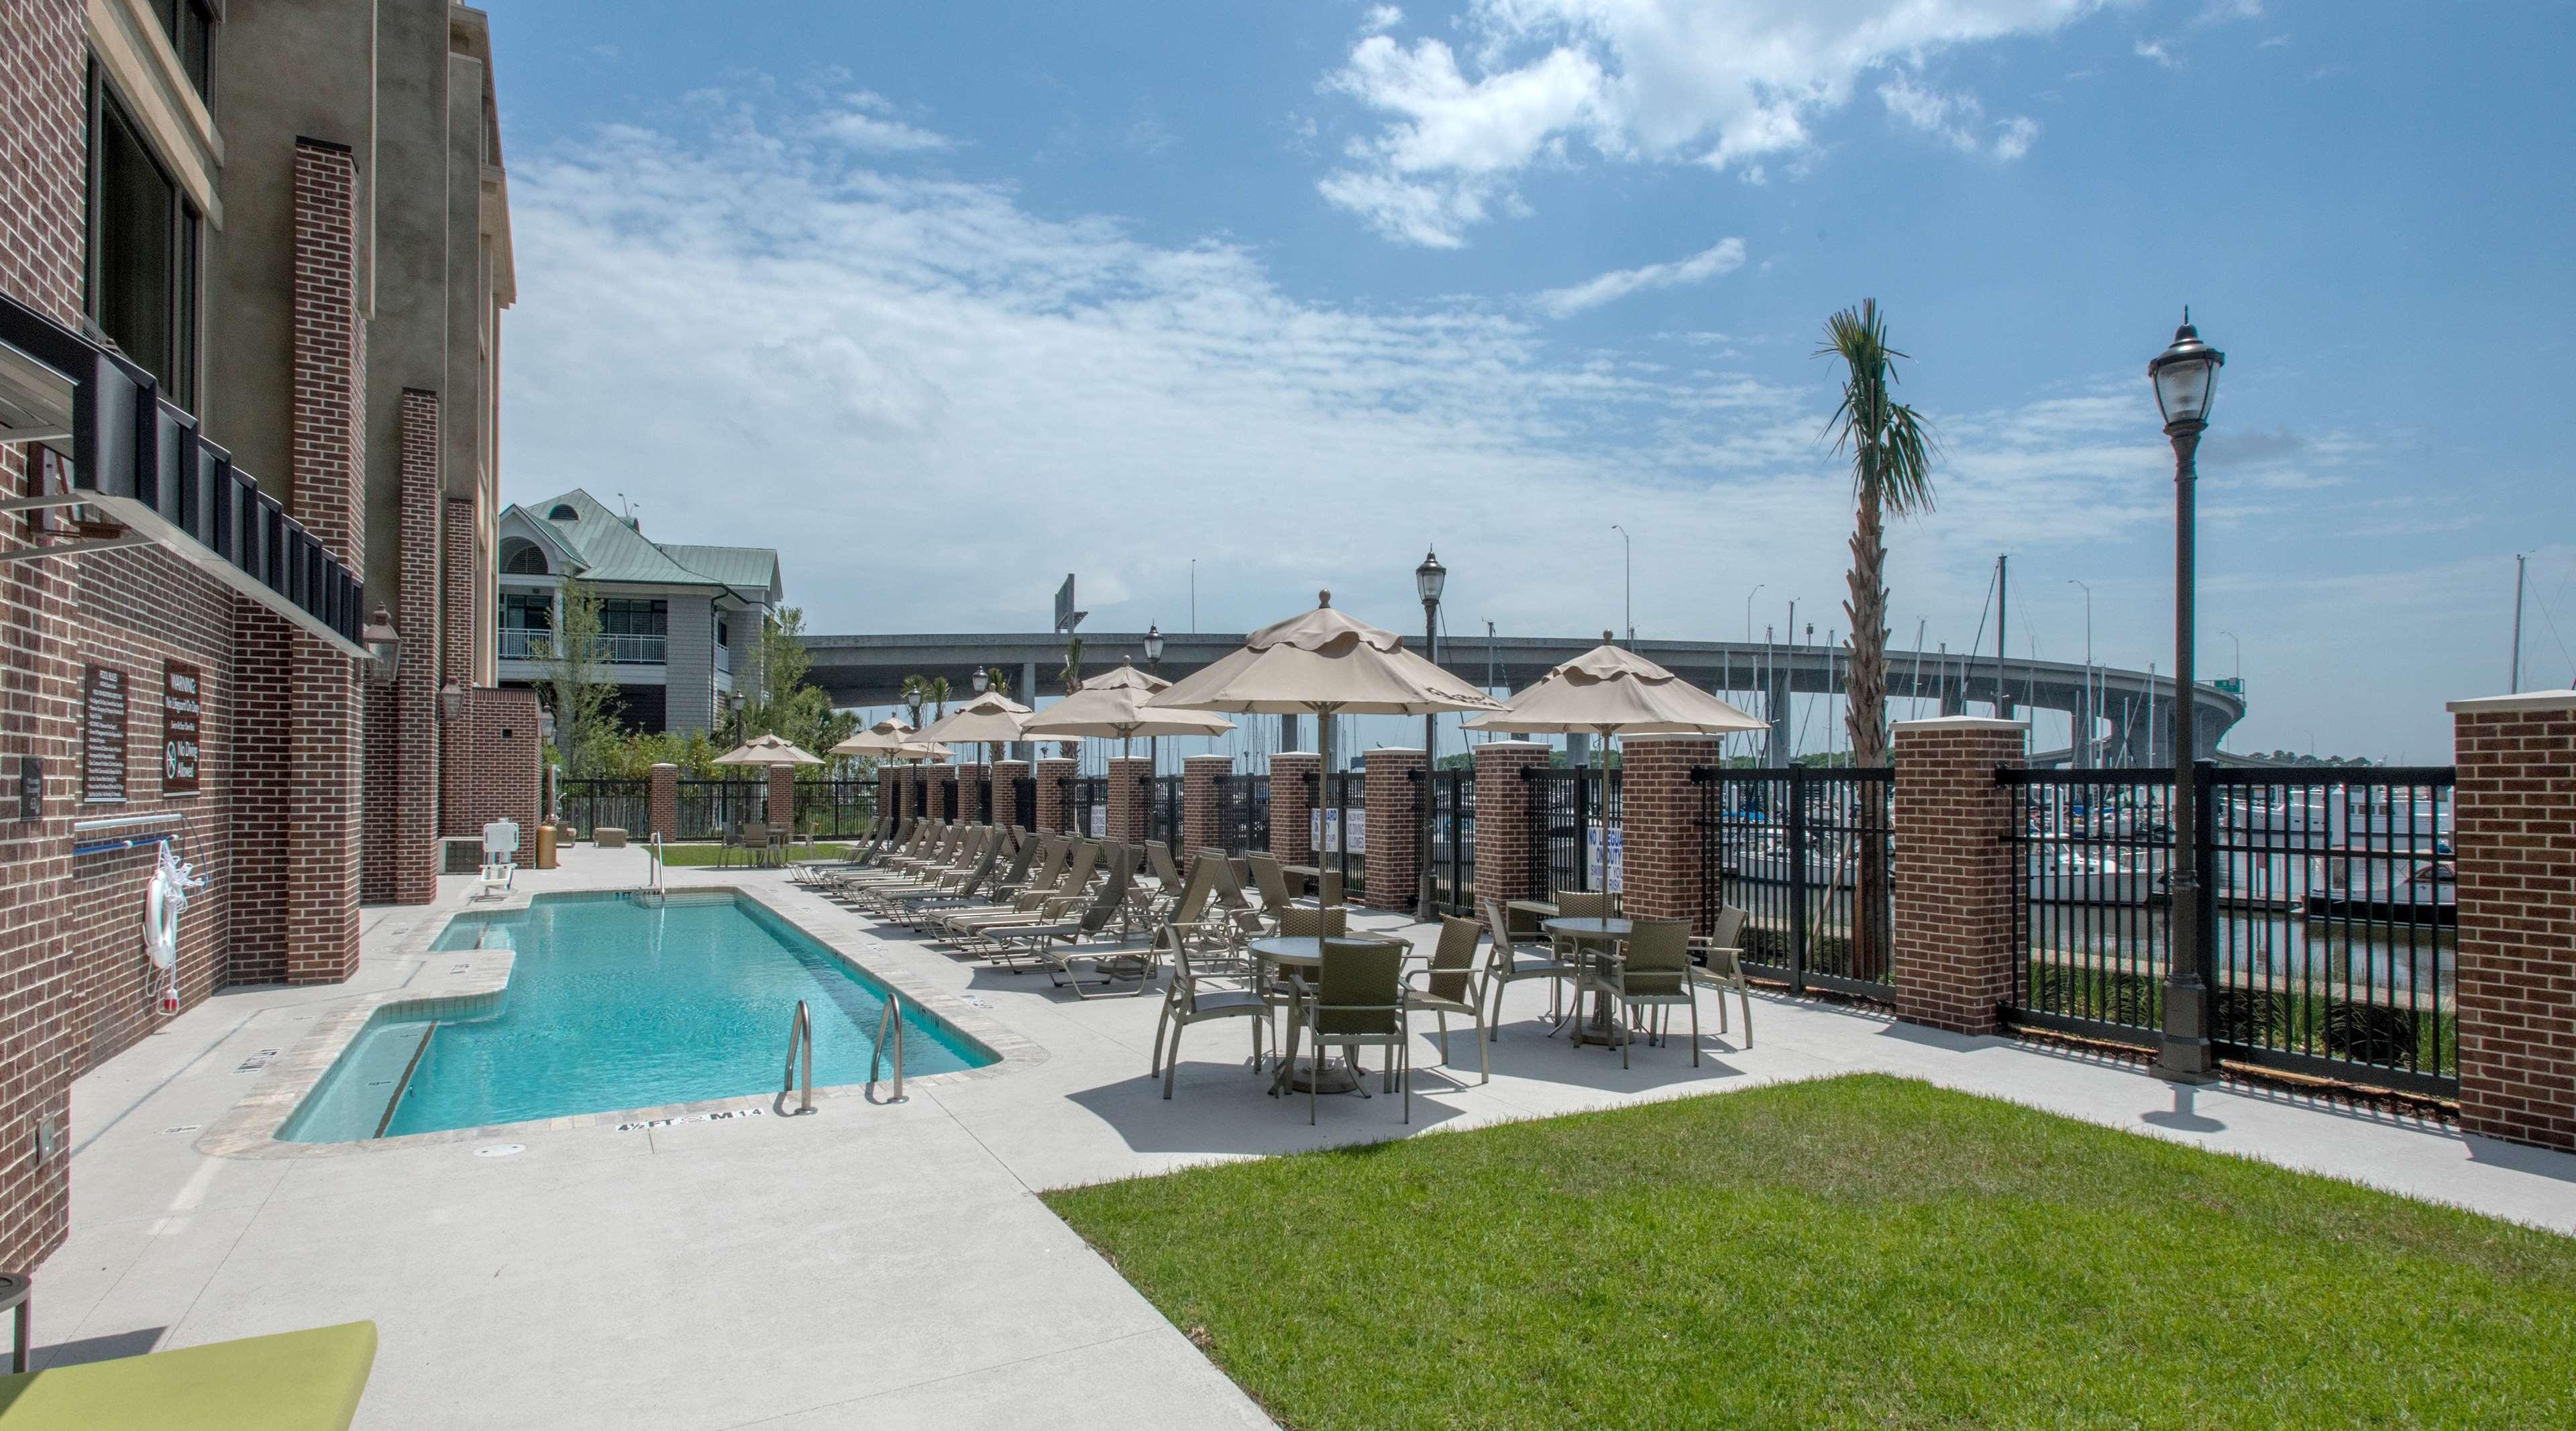 Hilton Garden Inn Charleston Waterfront/Downtown image 6